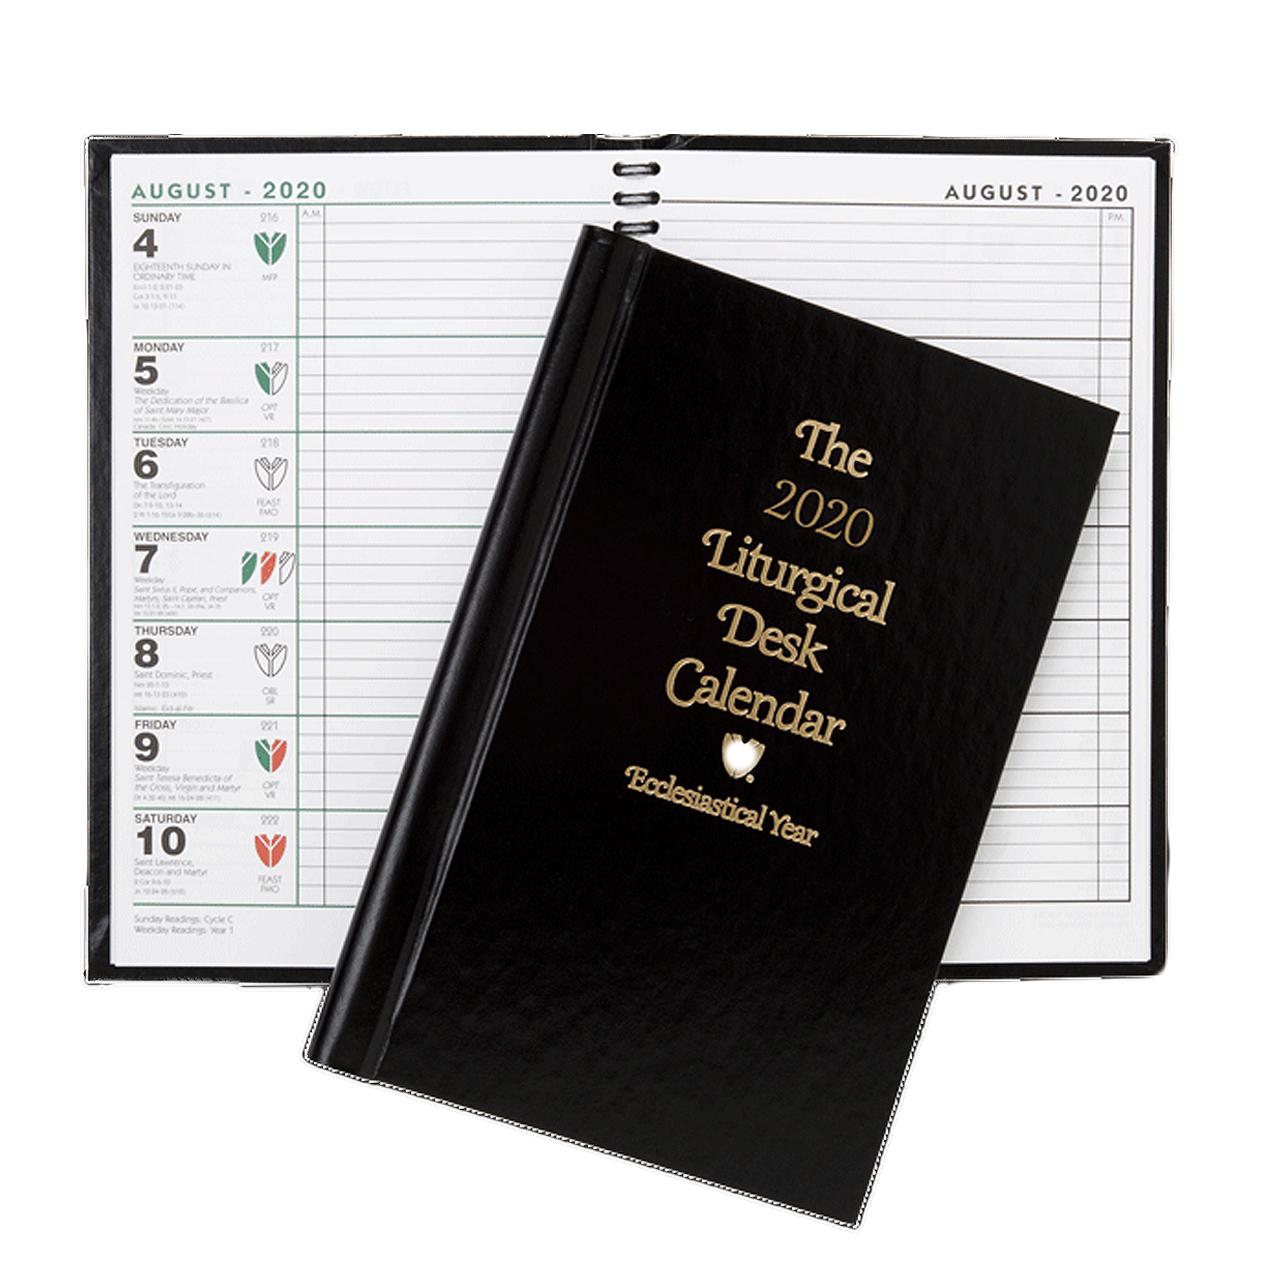 2020 Liturgical Desk Calendar 2020 Liturgical Desk Calendar   Ecclesiastical Year   Hardcover